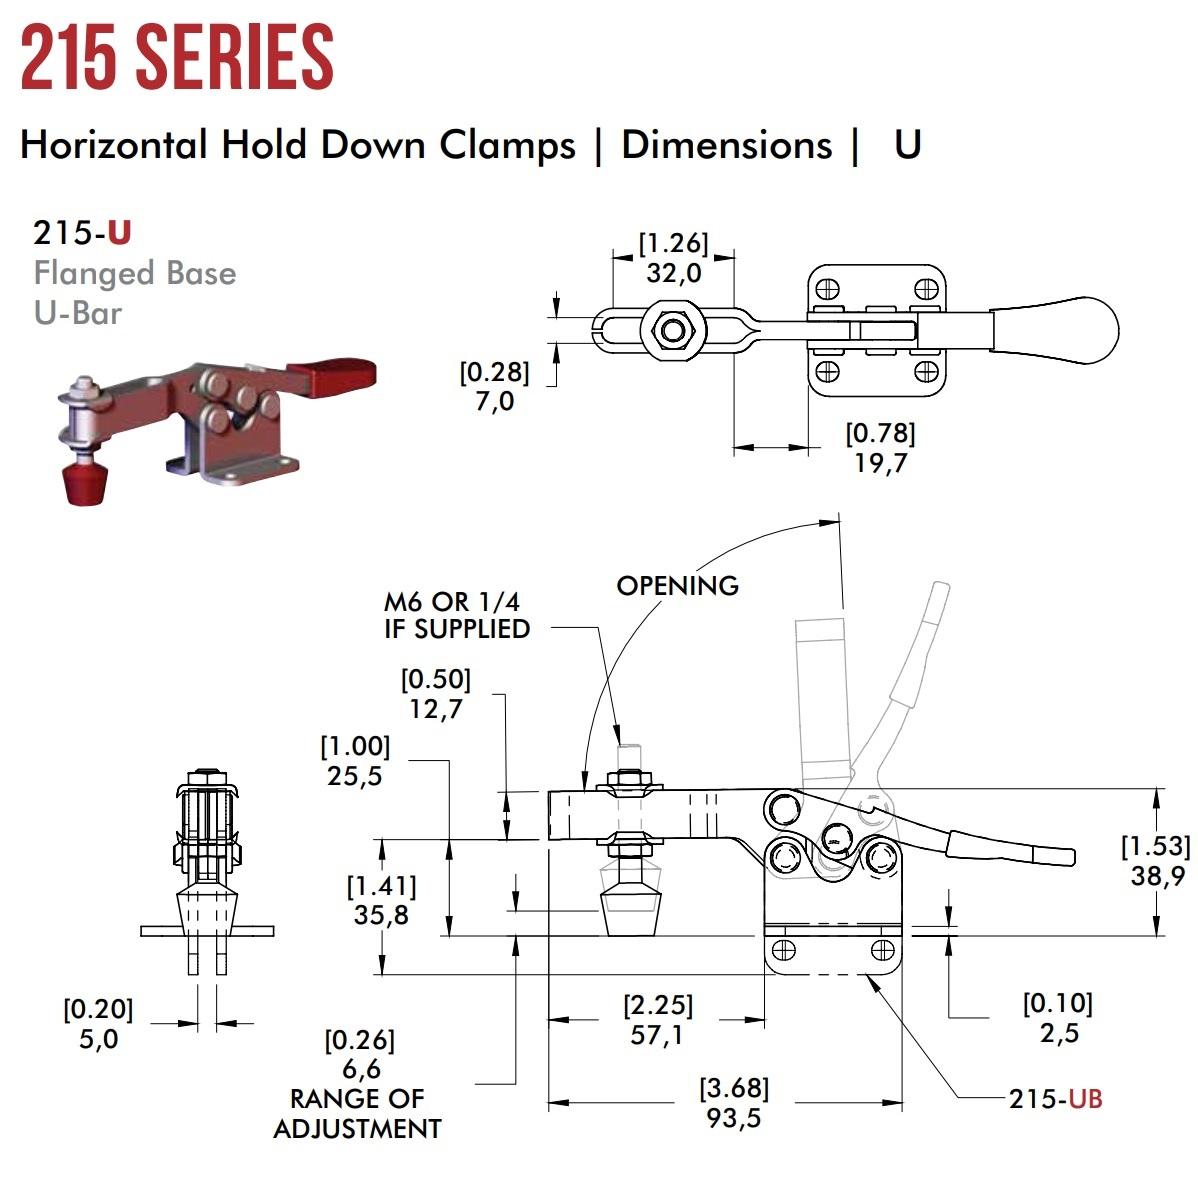 51092 destaco quick clamp 215u lever horizontal when clamped 2d dimensions